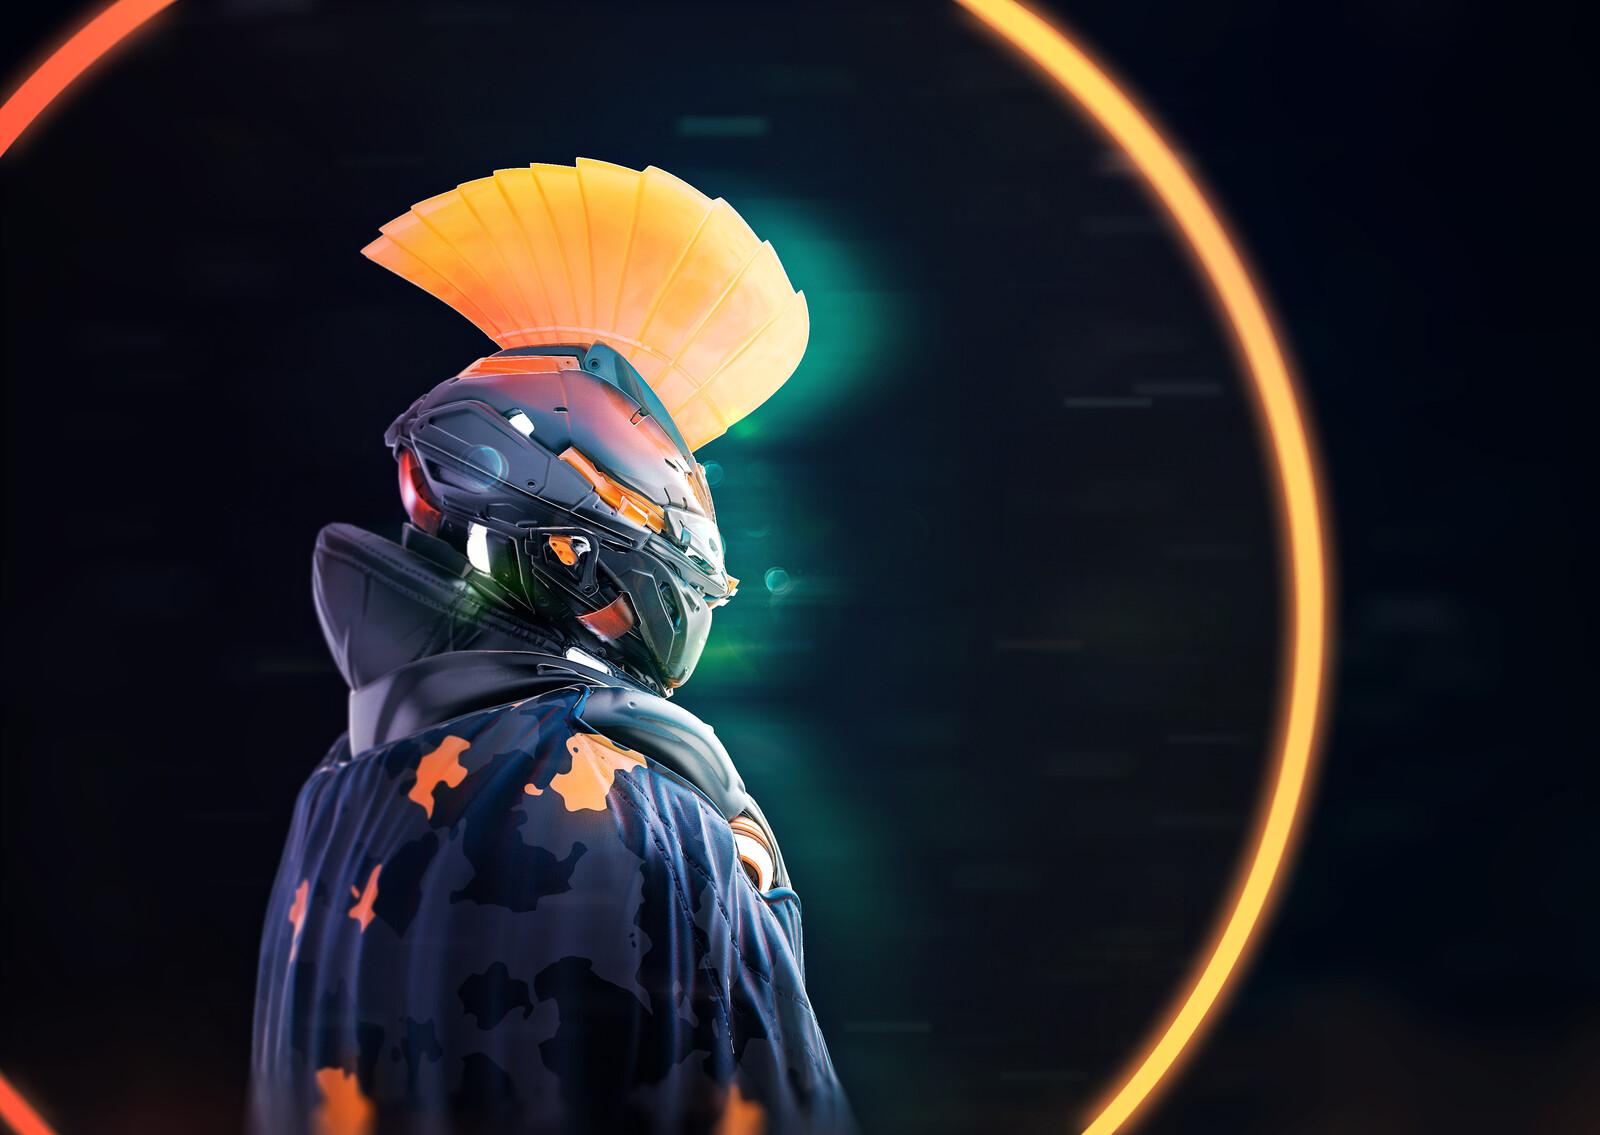 KnightBot